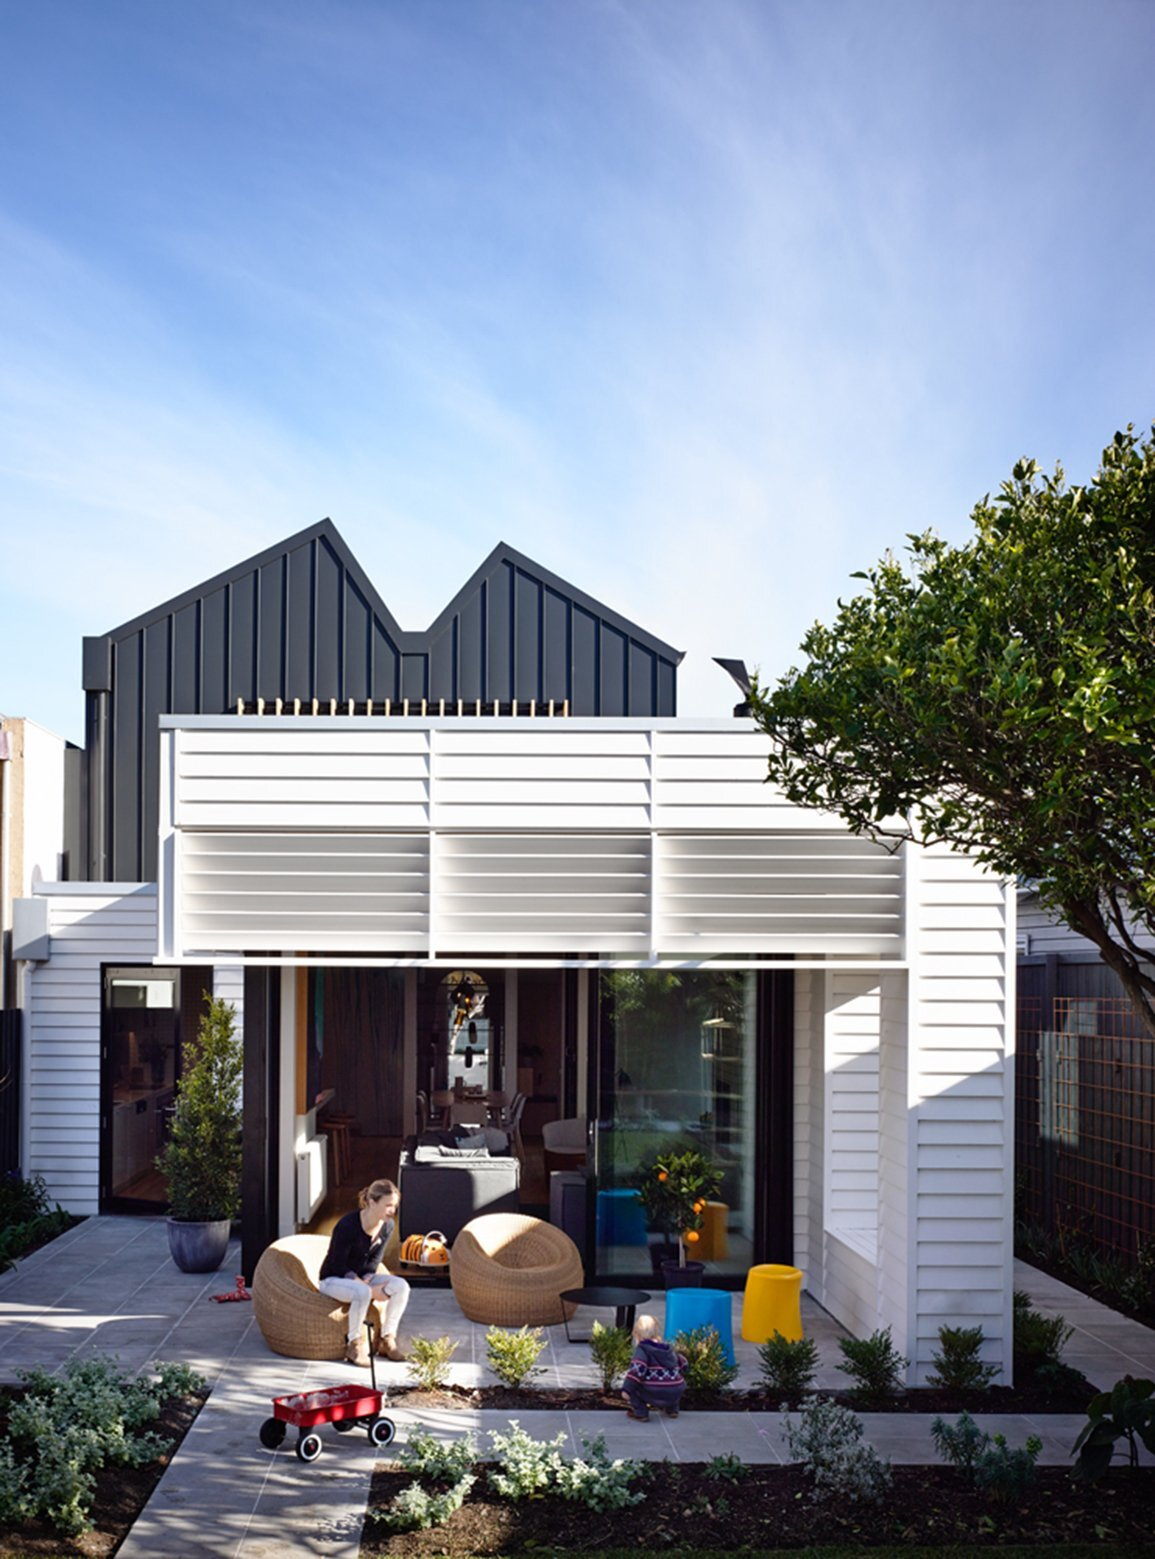 Sandringham House - Small House - Techne Architecture+Interior Design - Doherty Design Studio - Australia - Garden - Humble Homes